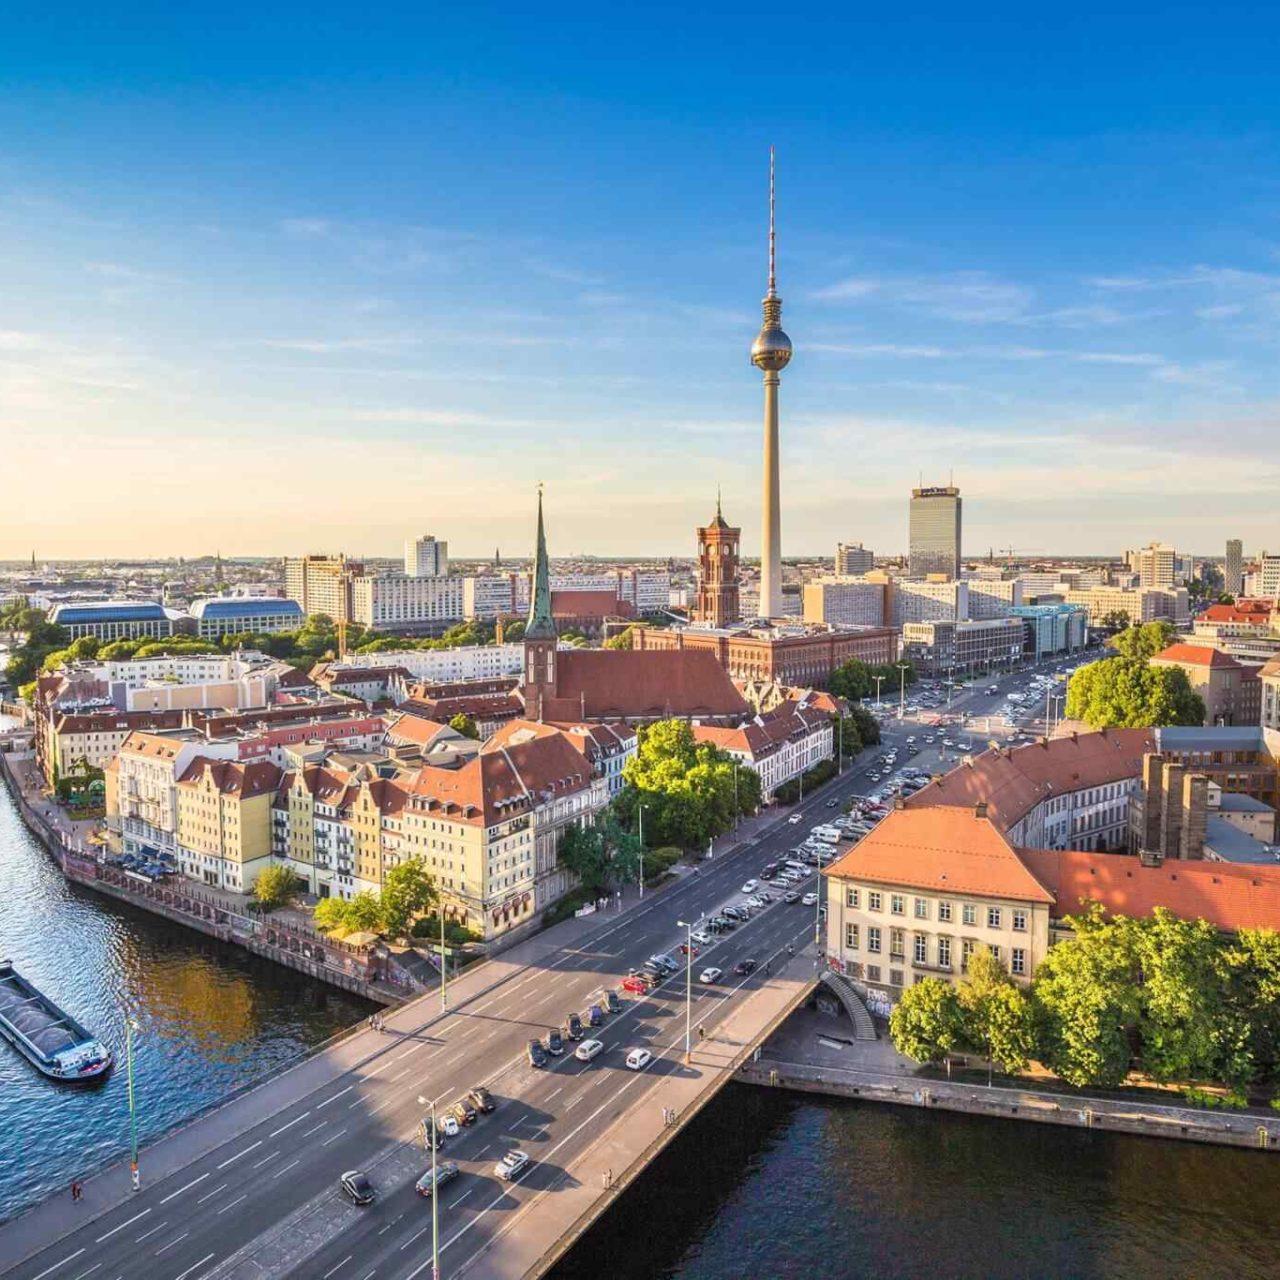 https://www.italiaholiday.it/wp-content/uploads/2018/09/destination-berlin-05-1280x1280.jpg